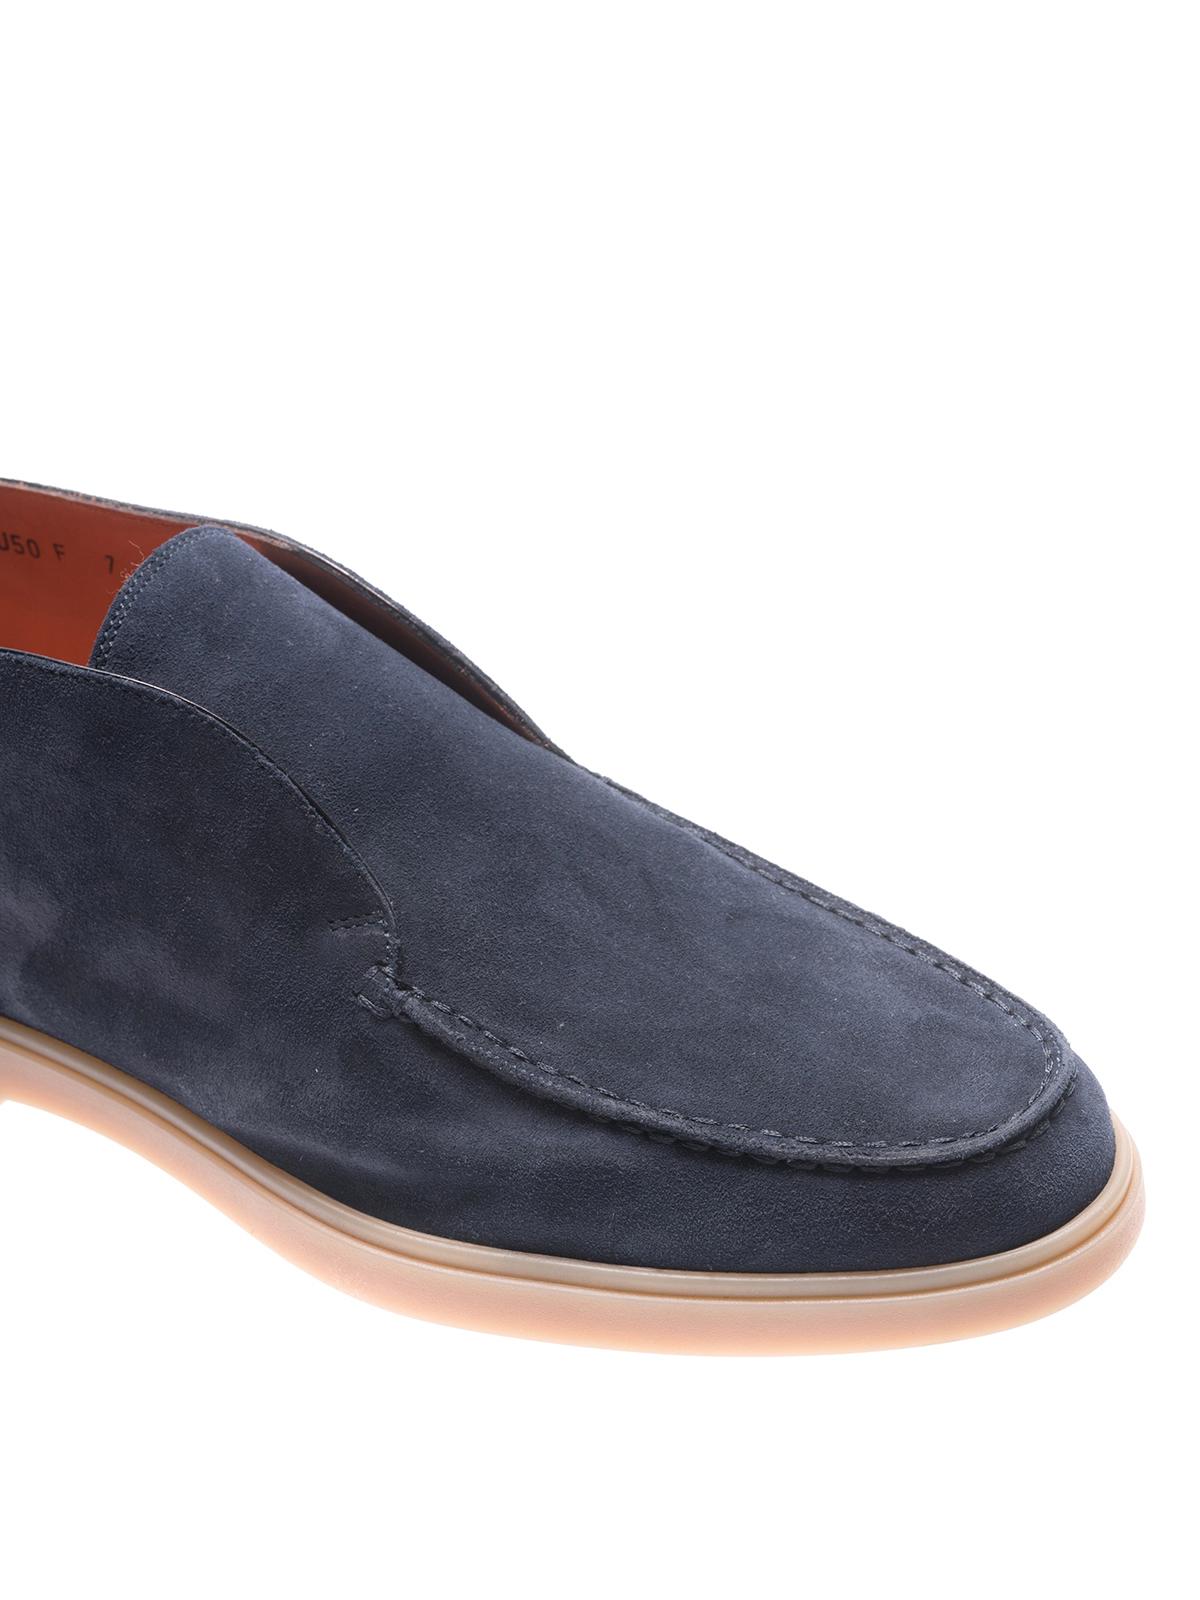 Santoni - Suede slip-on ankle boots